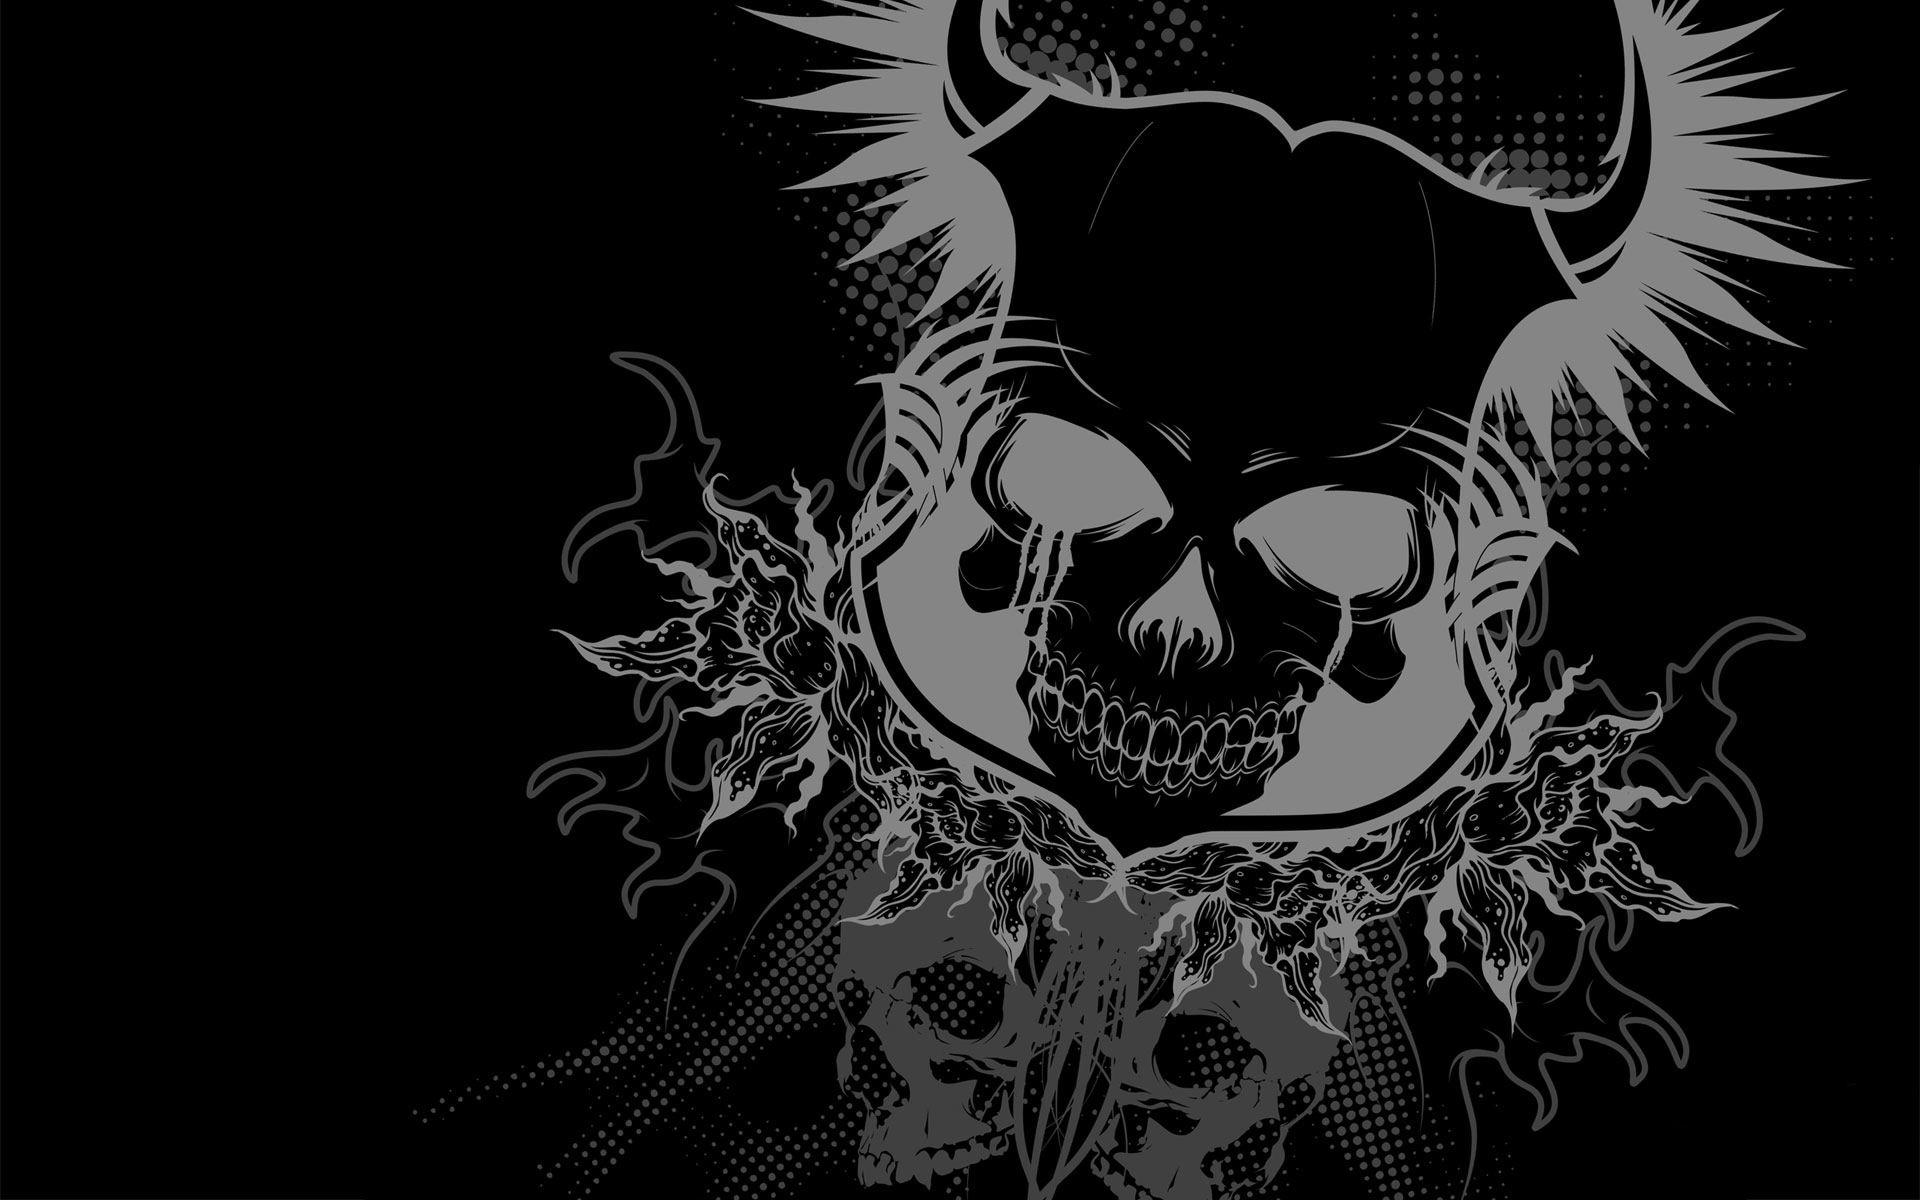 AmazingWallpapers1200 Anime Pinterest Devil and